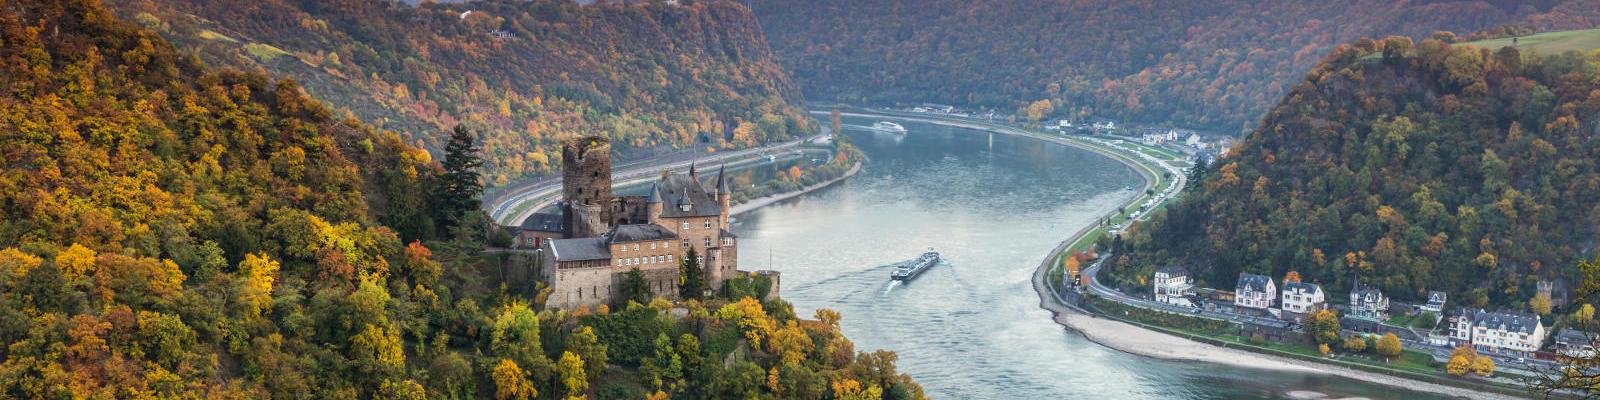 burg katz castle germany and rhine river